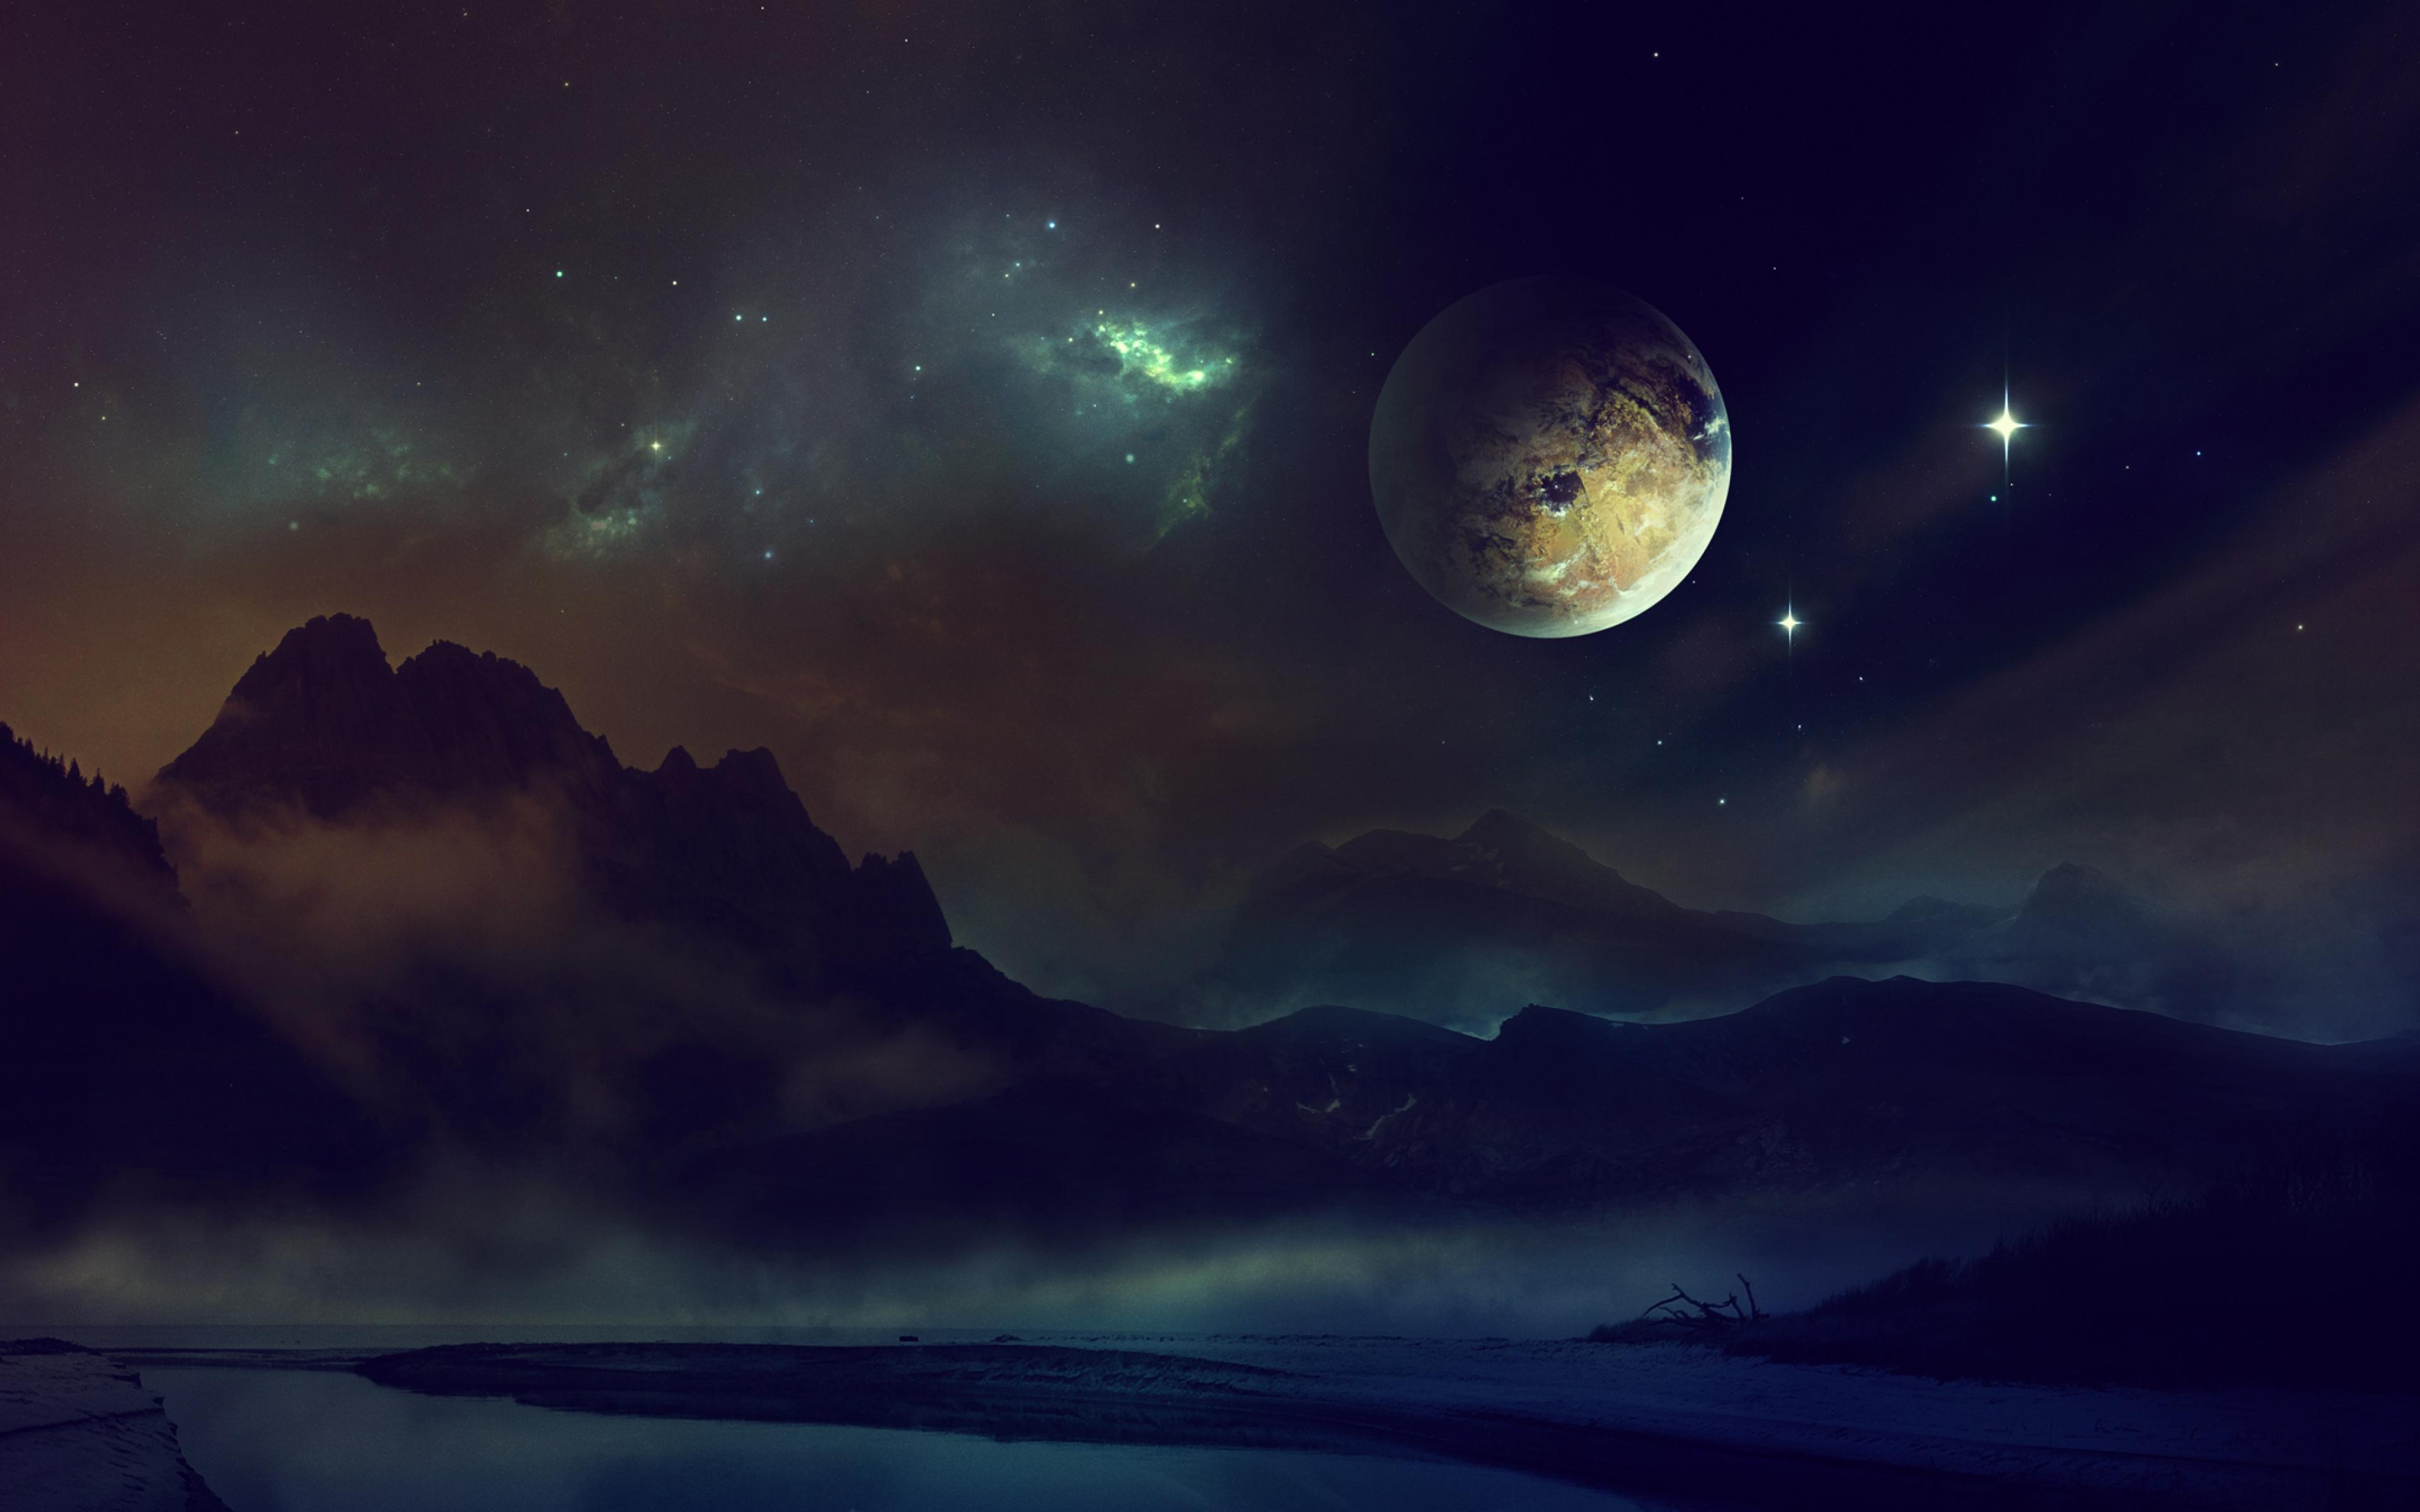 3840x2400 Wallpaper space planet light night sky 3840x2400